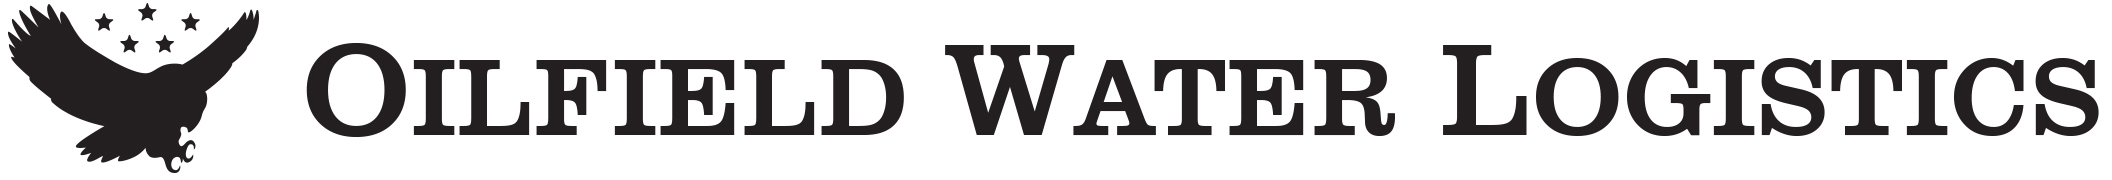 Oilfield Water Logistics logo